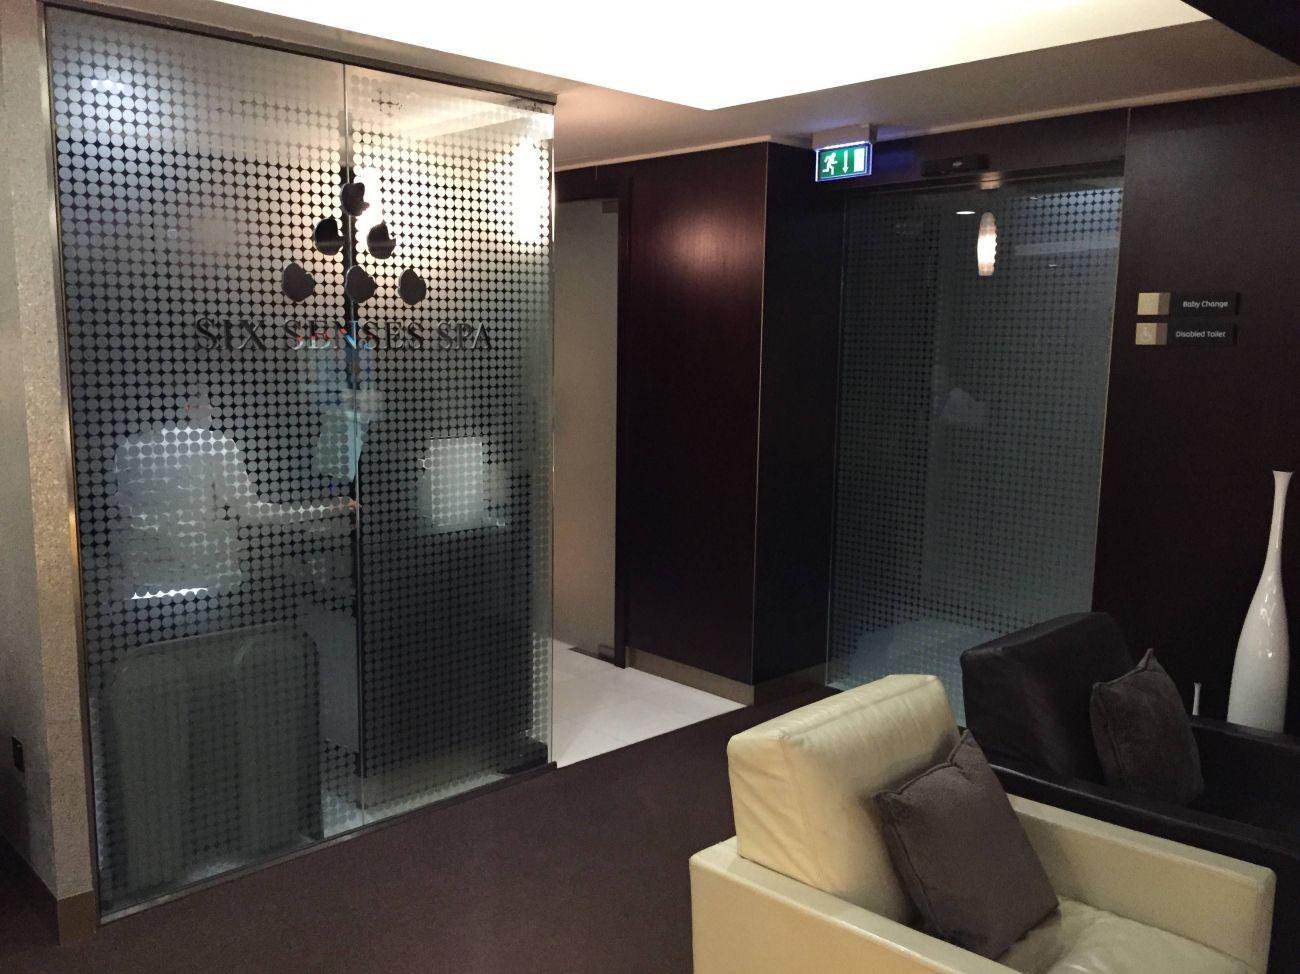 Etihad Lounge London Heathrow - Passageirodeprimeira 16